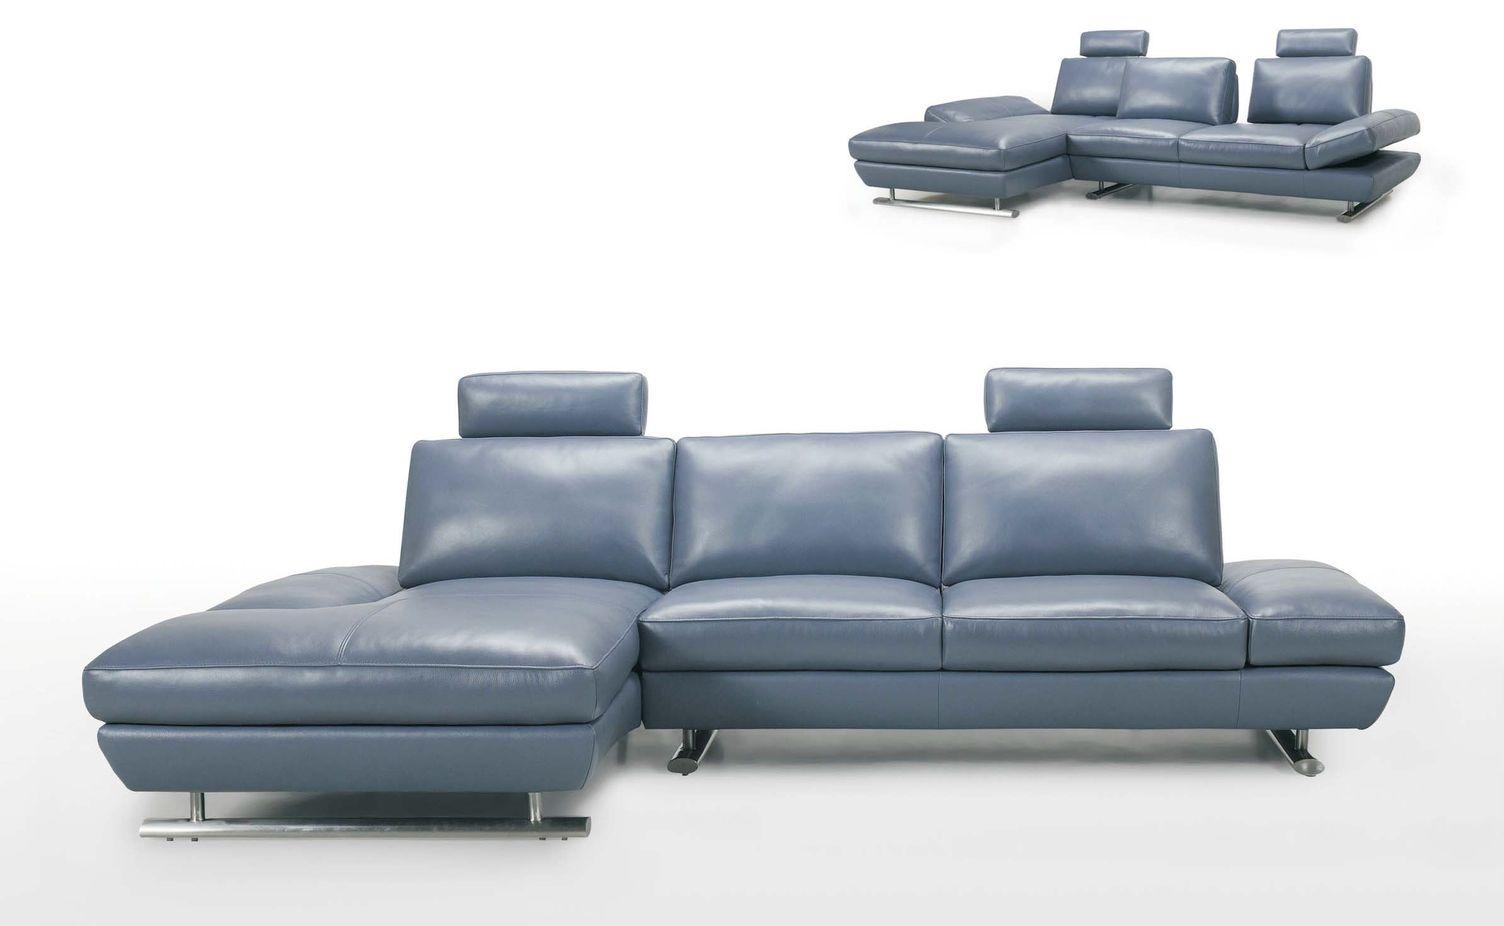 Kožená sedačka Bari